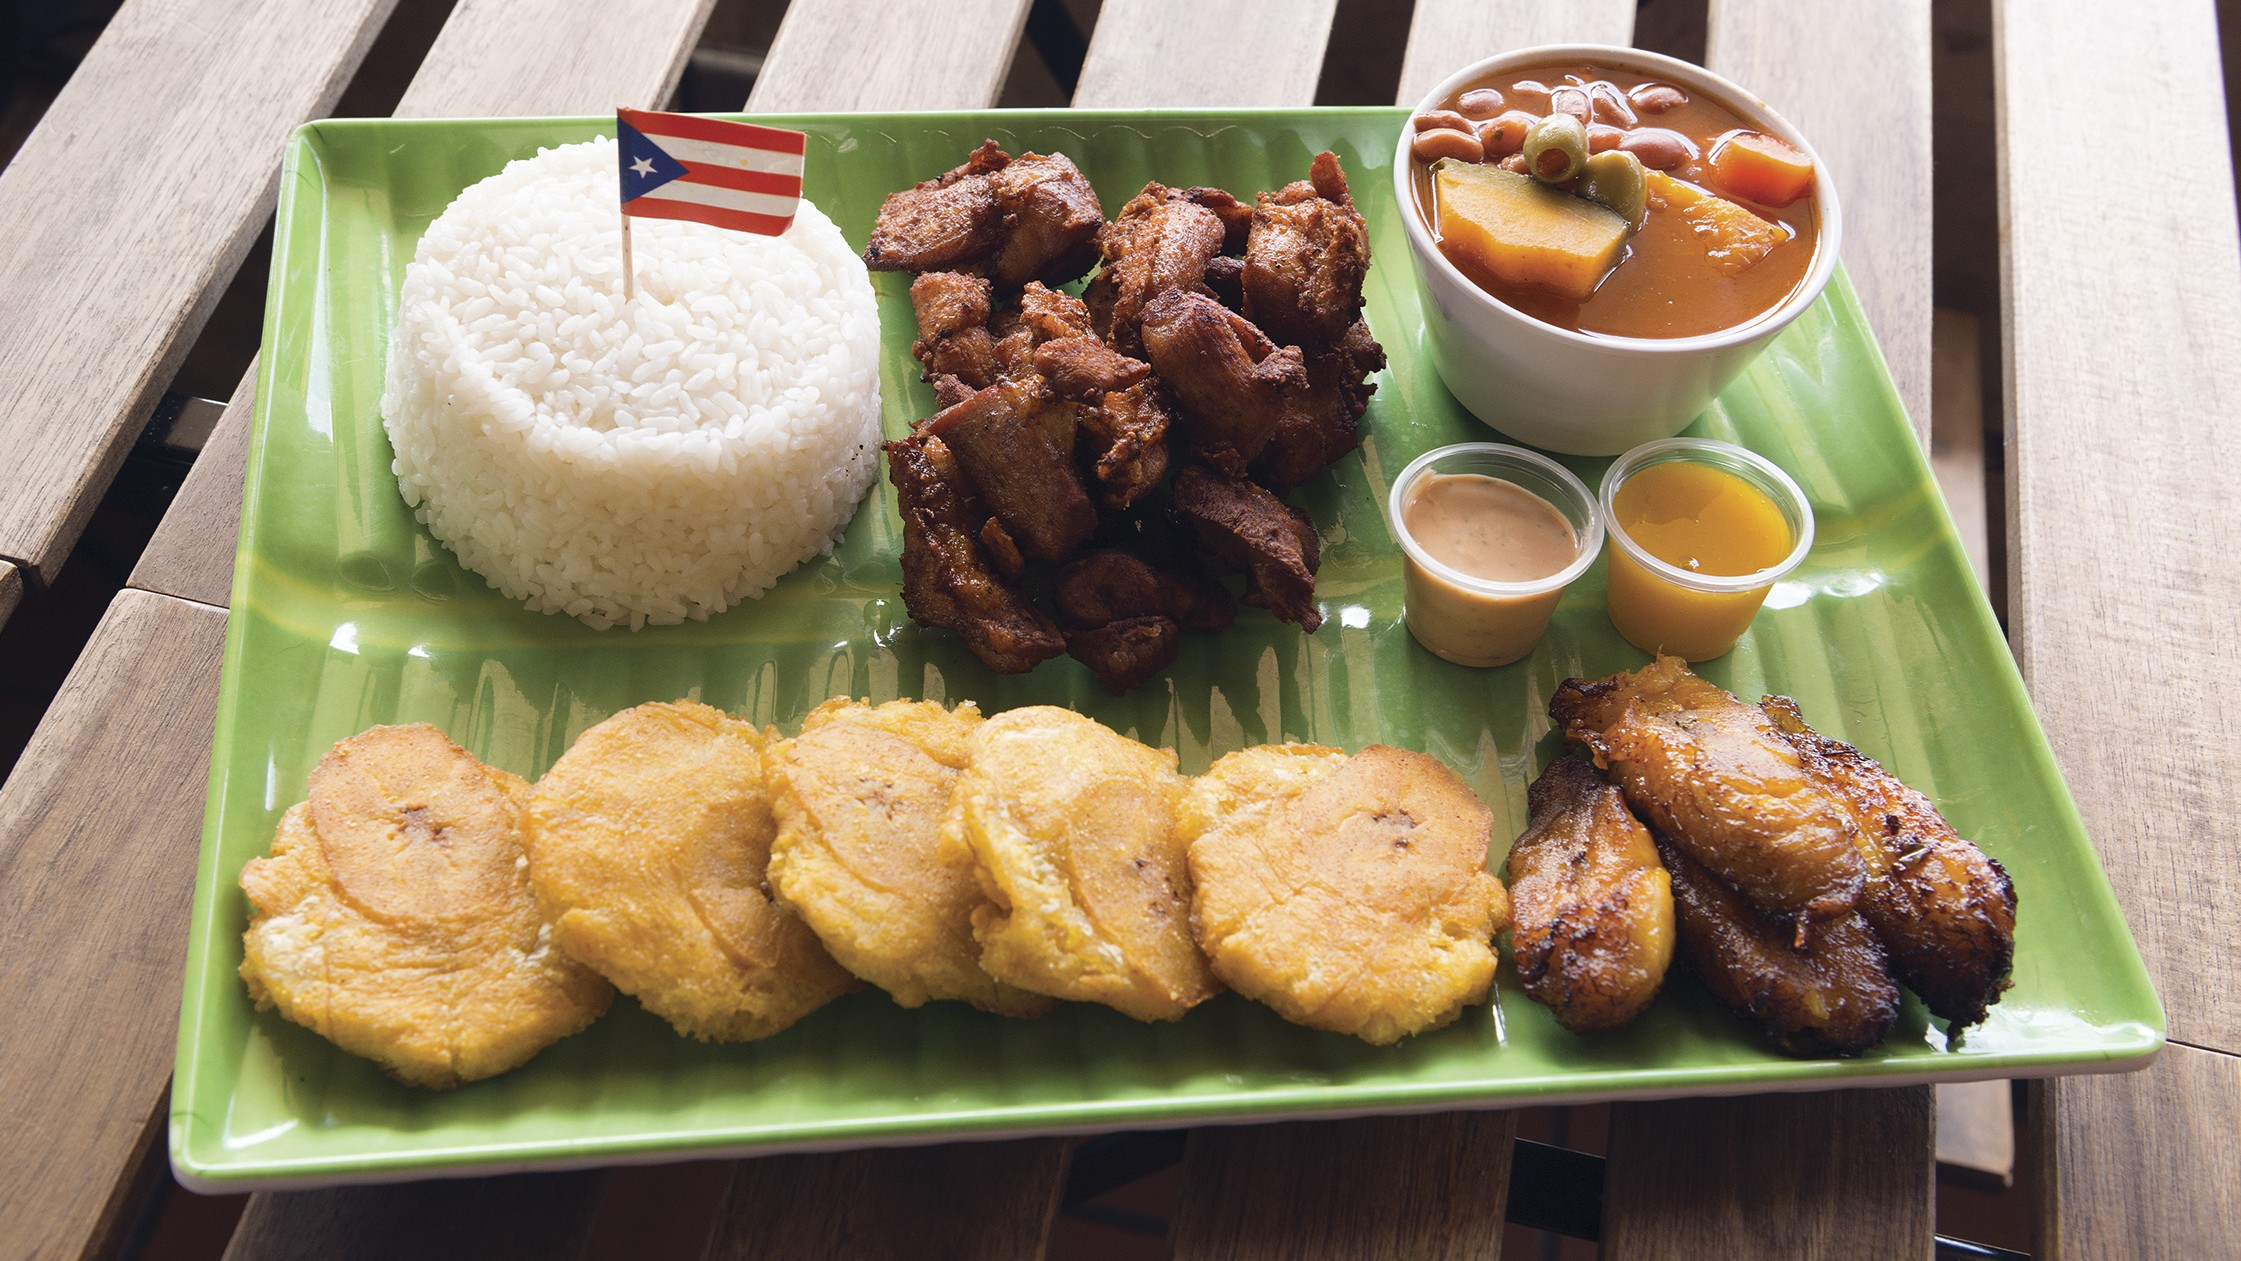 La Perla Serves Puerto Rican Food With Soul East Bay Express